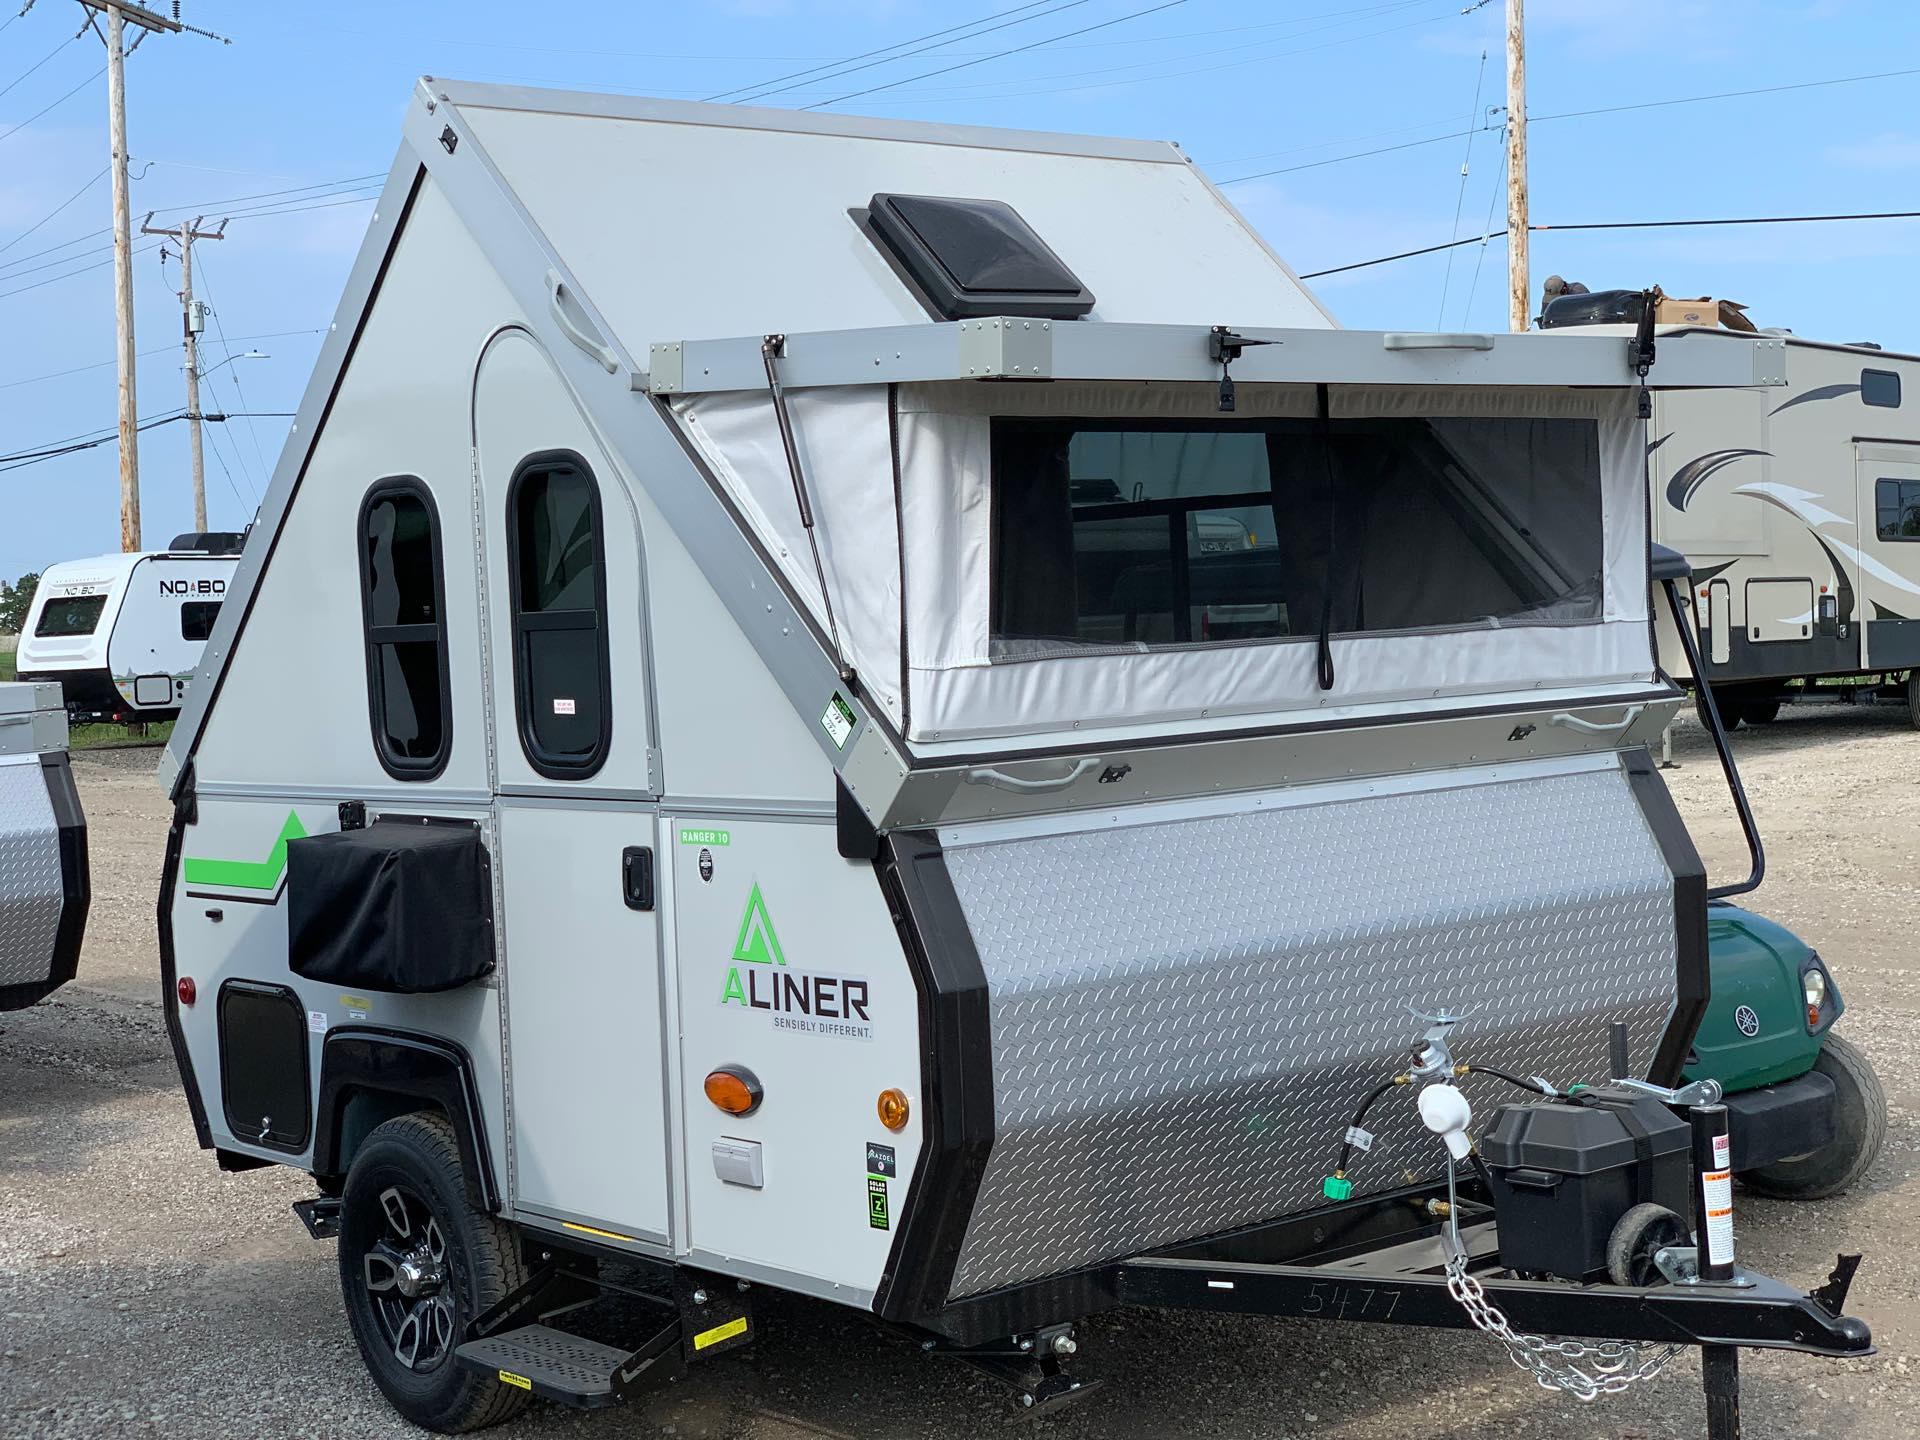 2022 Aliner Ranger 10 Bunk at Prosser's Premium RV Outlet